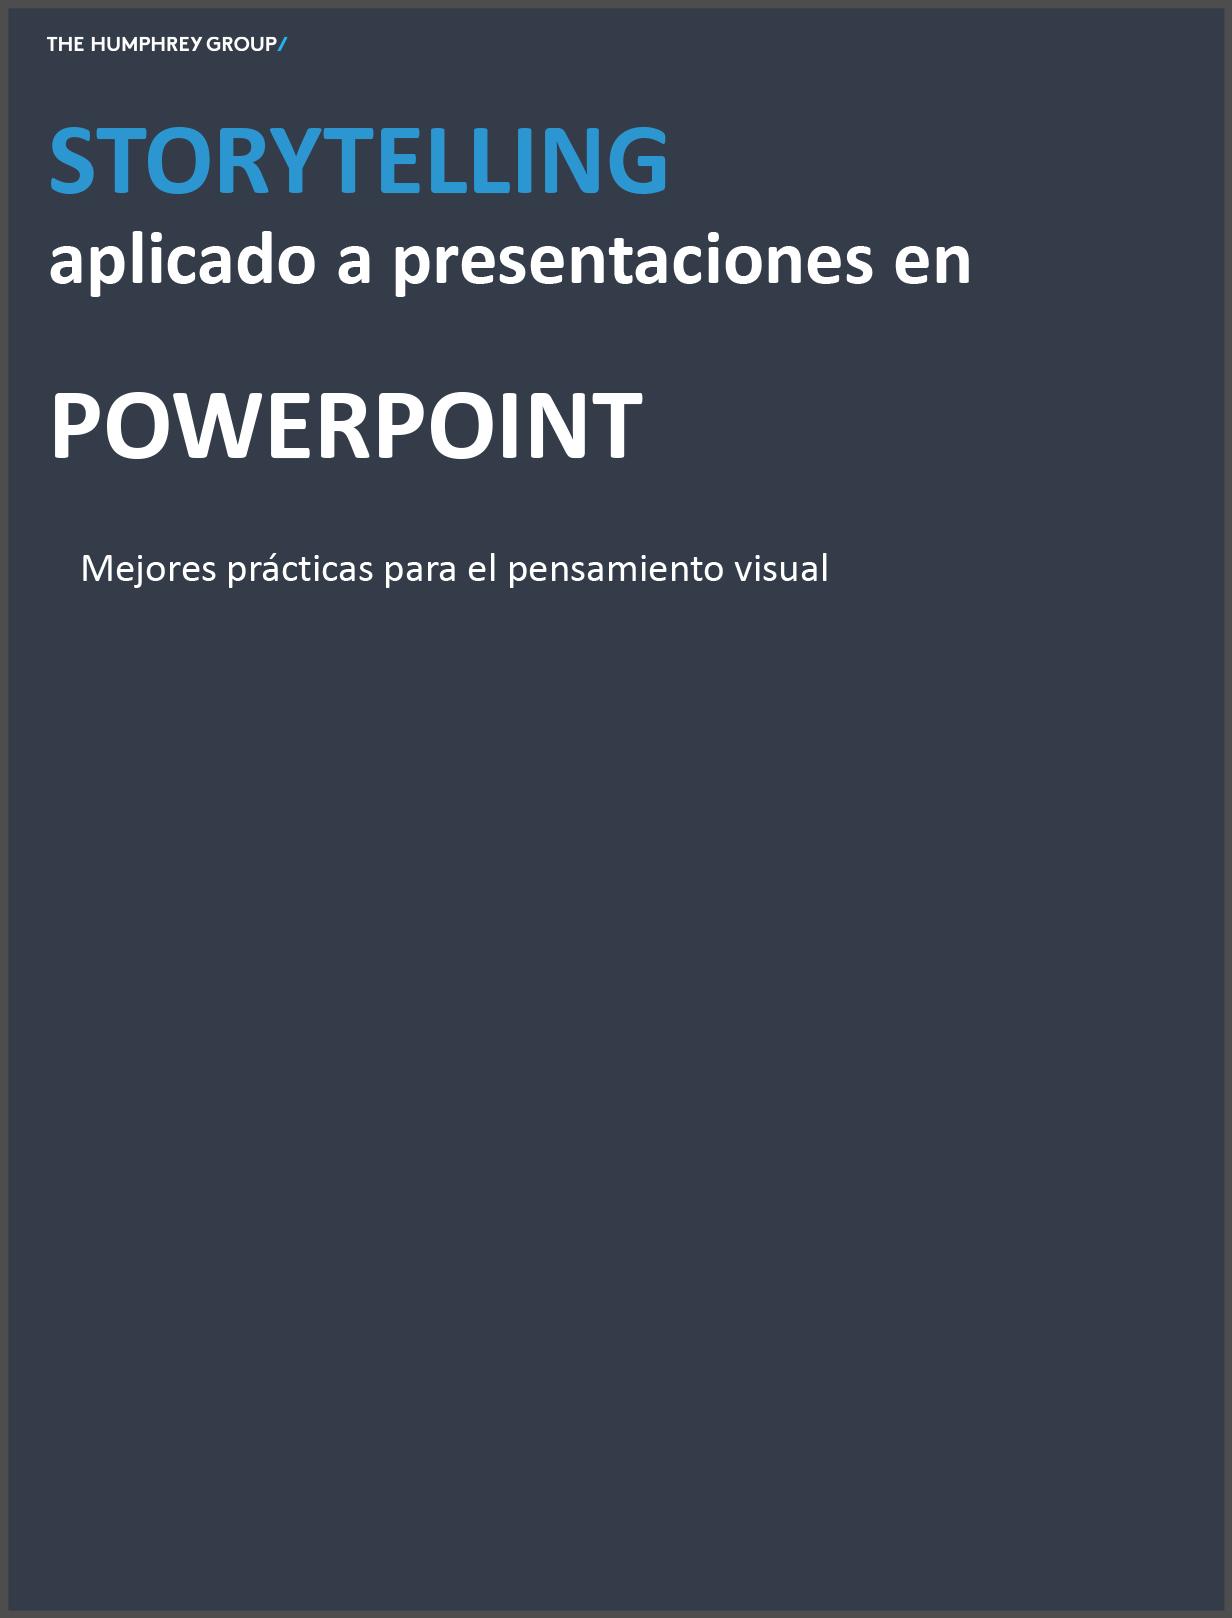 Mercer Powerpoint Slides ES.jpg